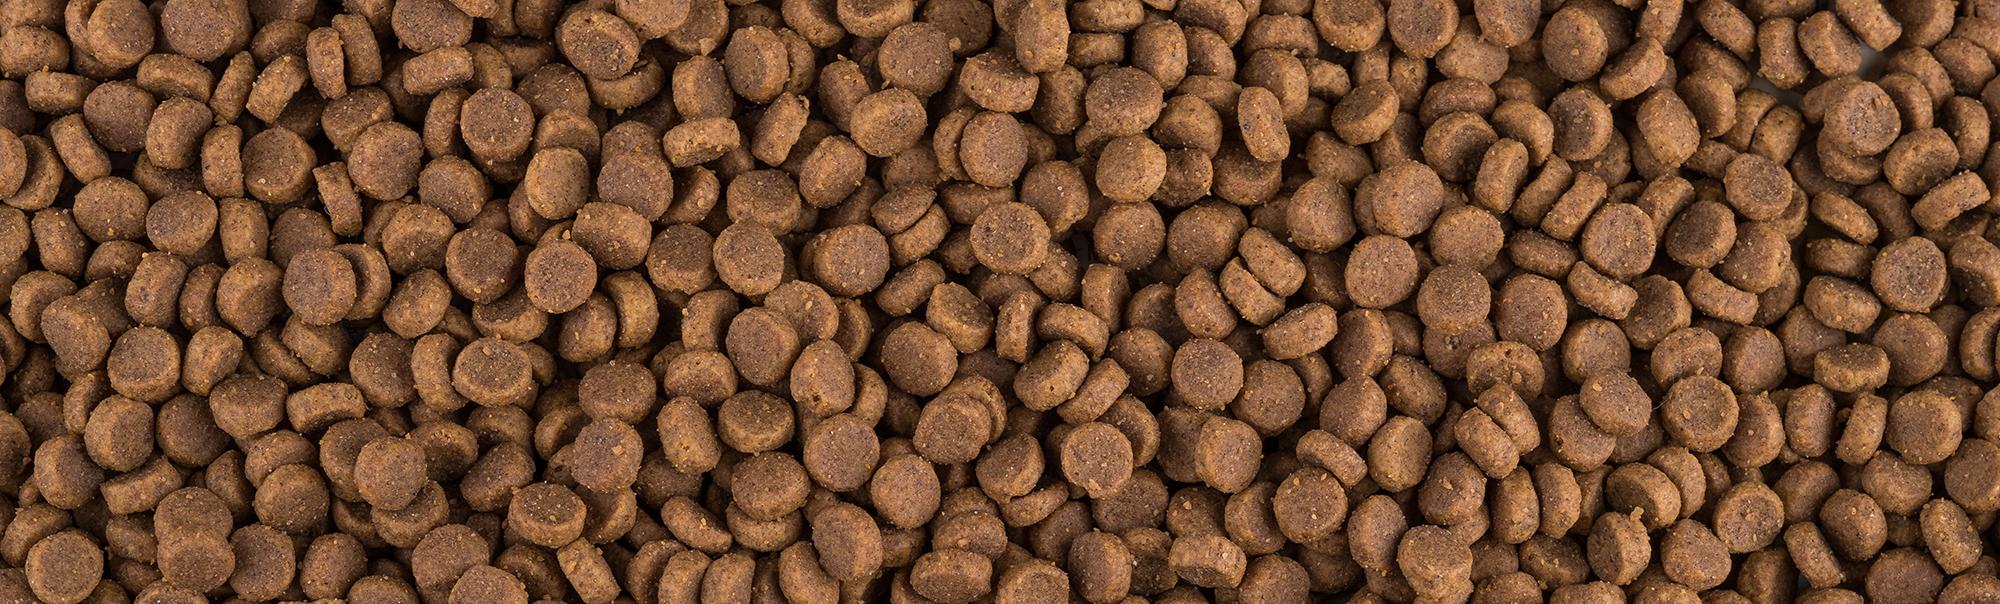 Dry Pet Food